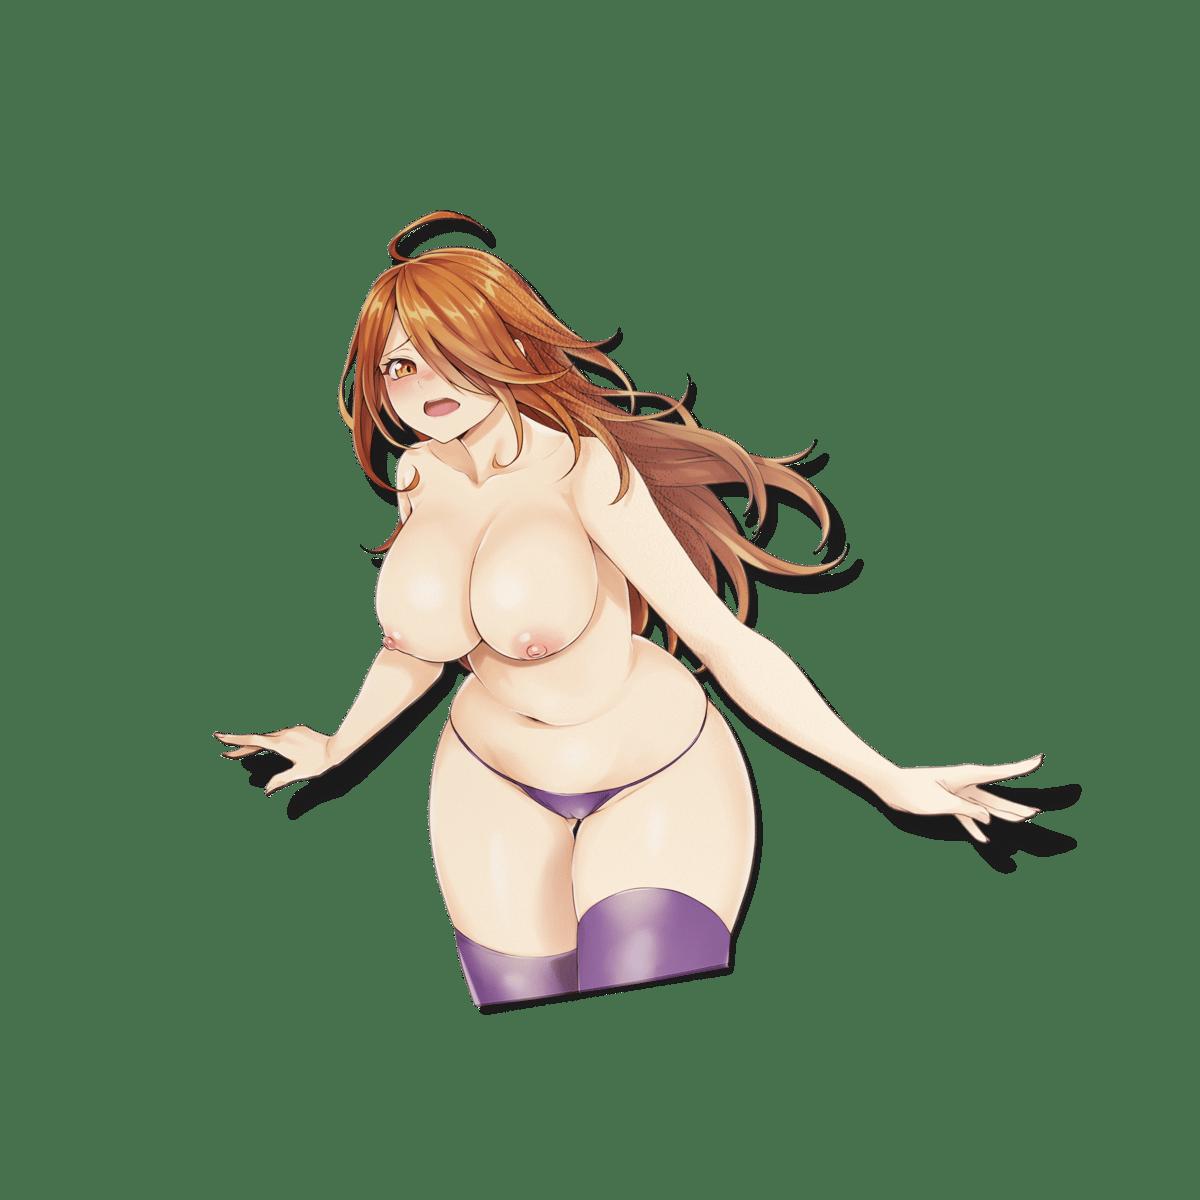 Image of Wiz Half Body Lewd